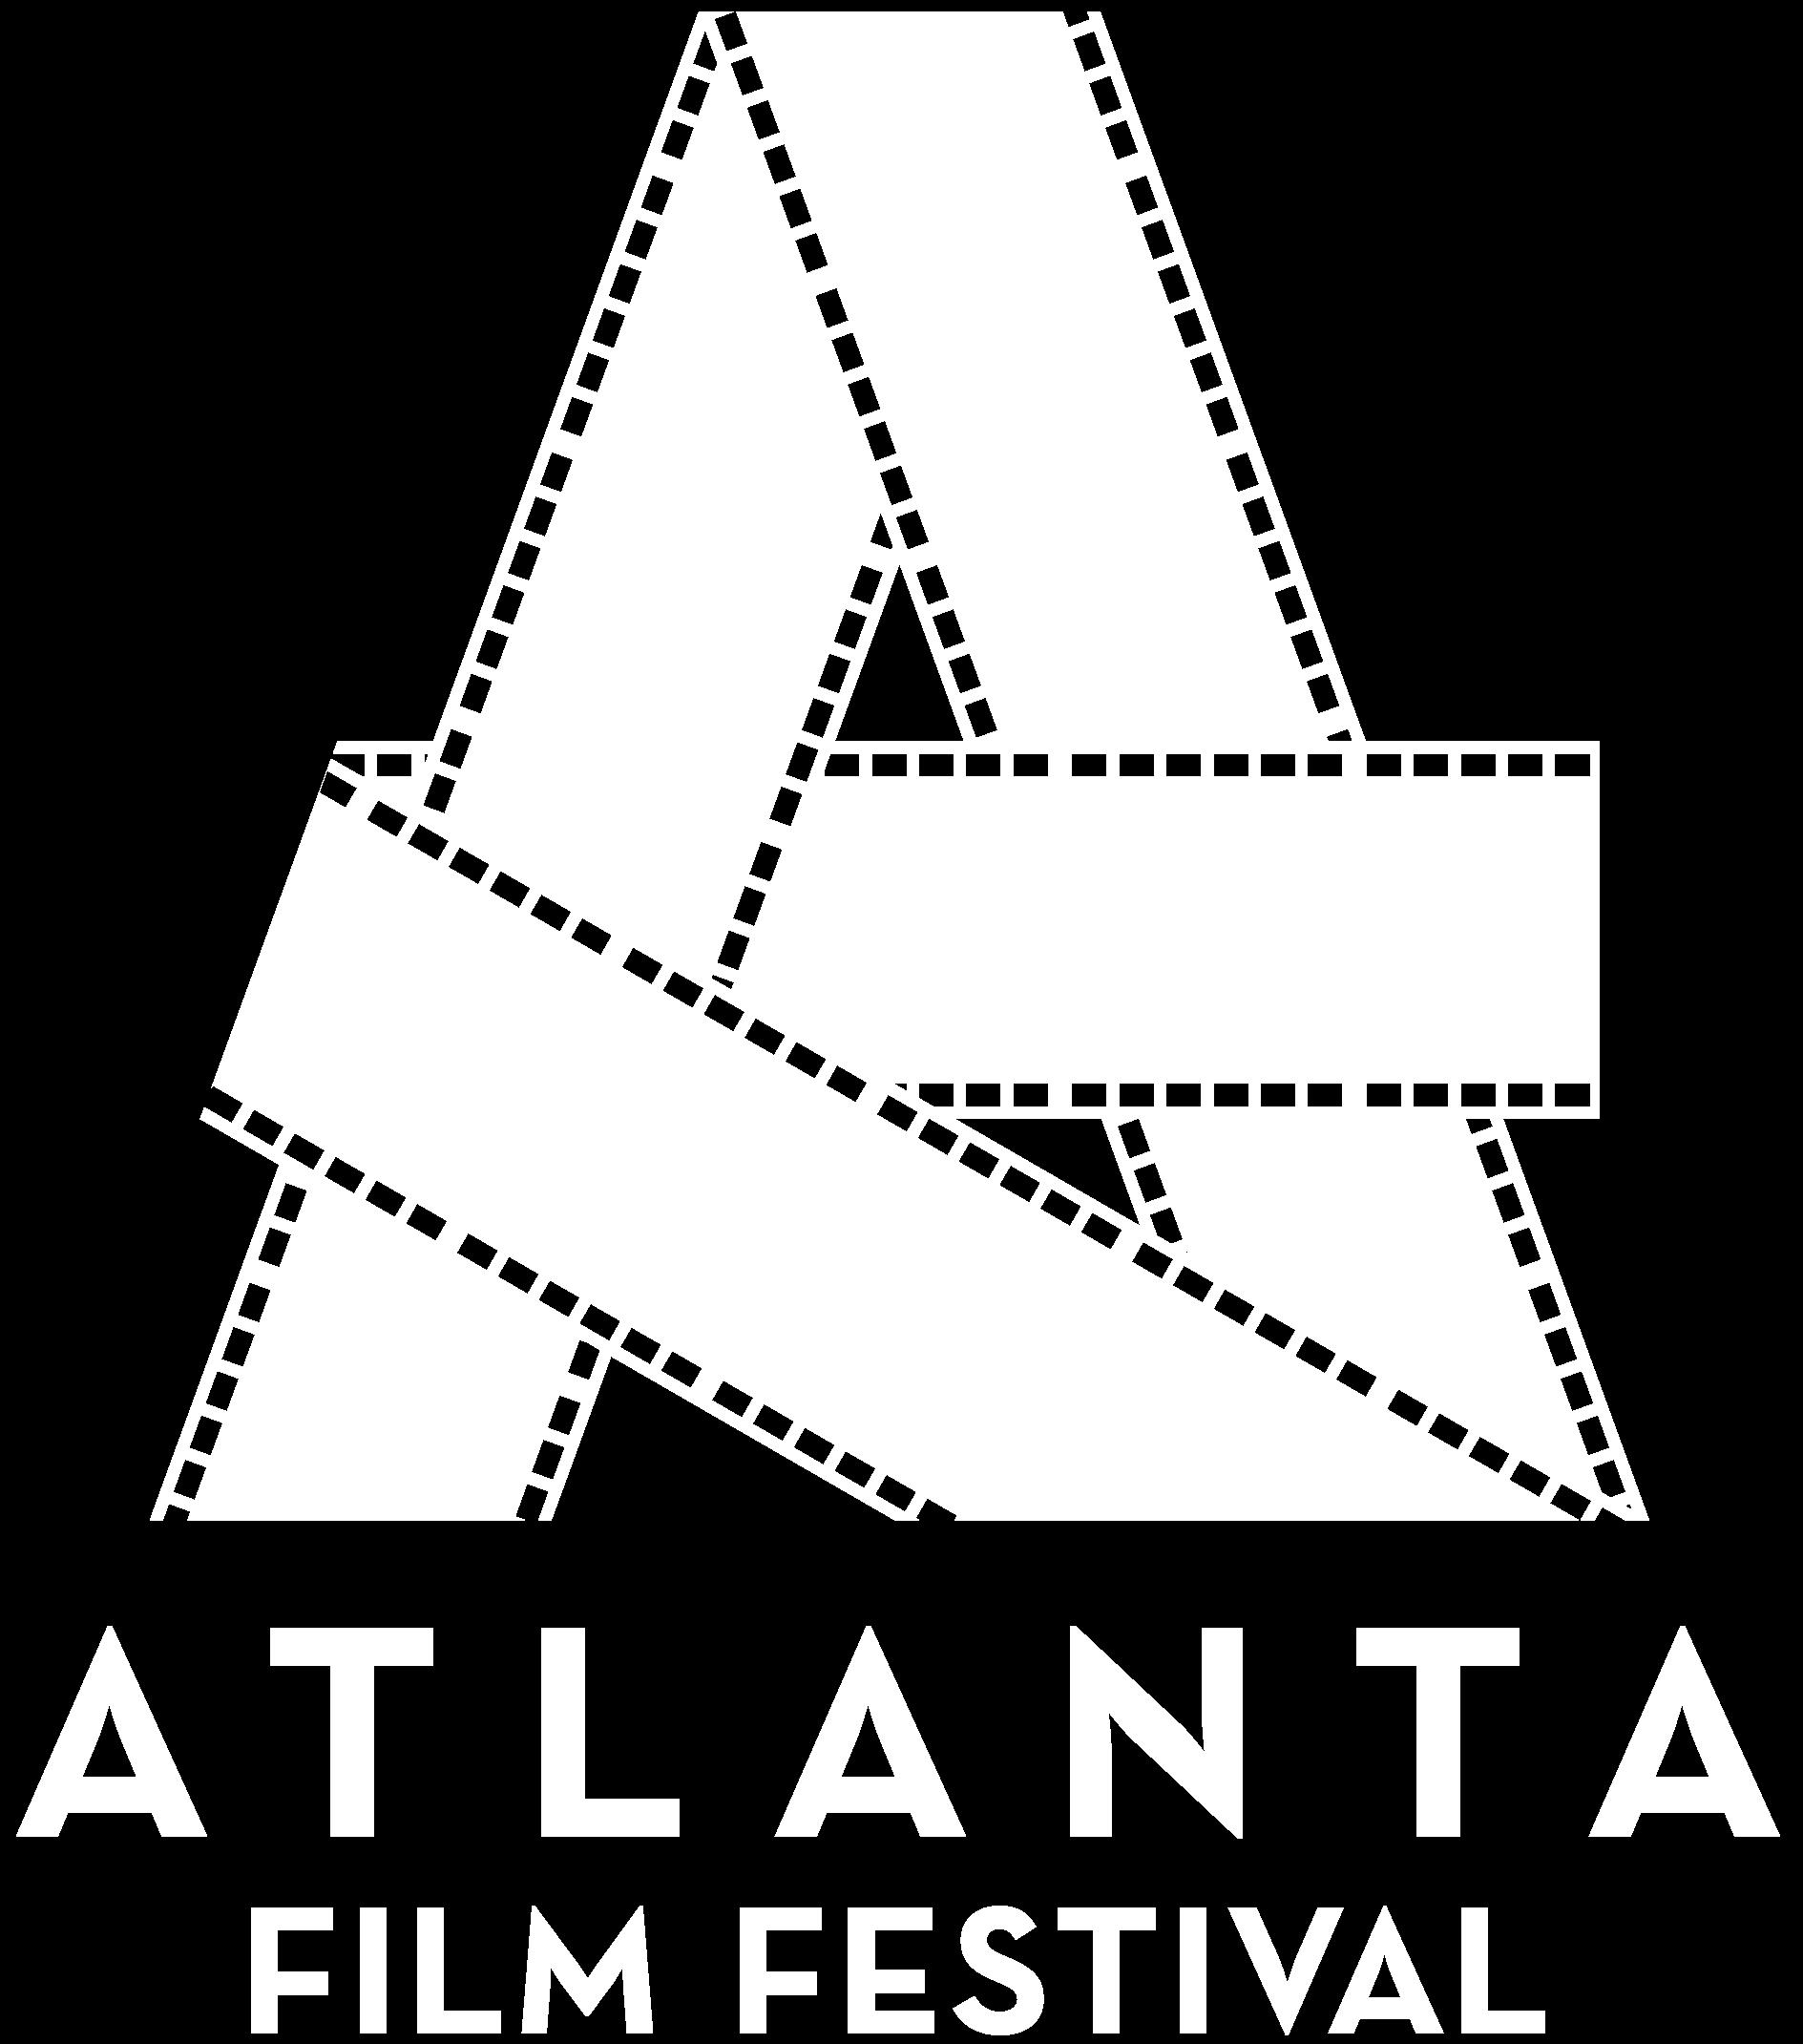 Full 40th Anniversary Film Lineup Announced Atlanta Film Festival